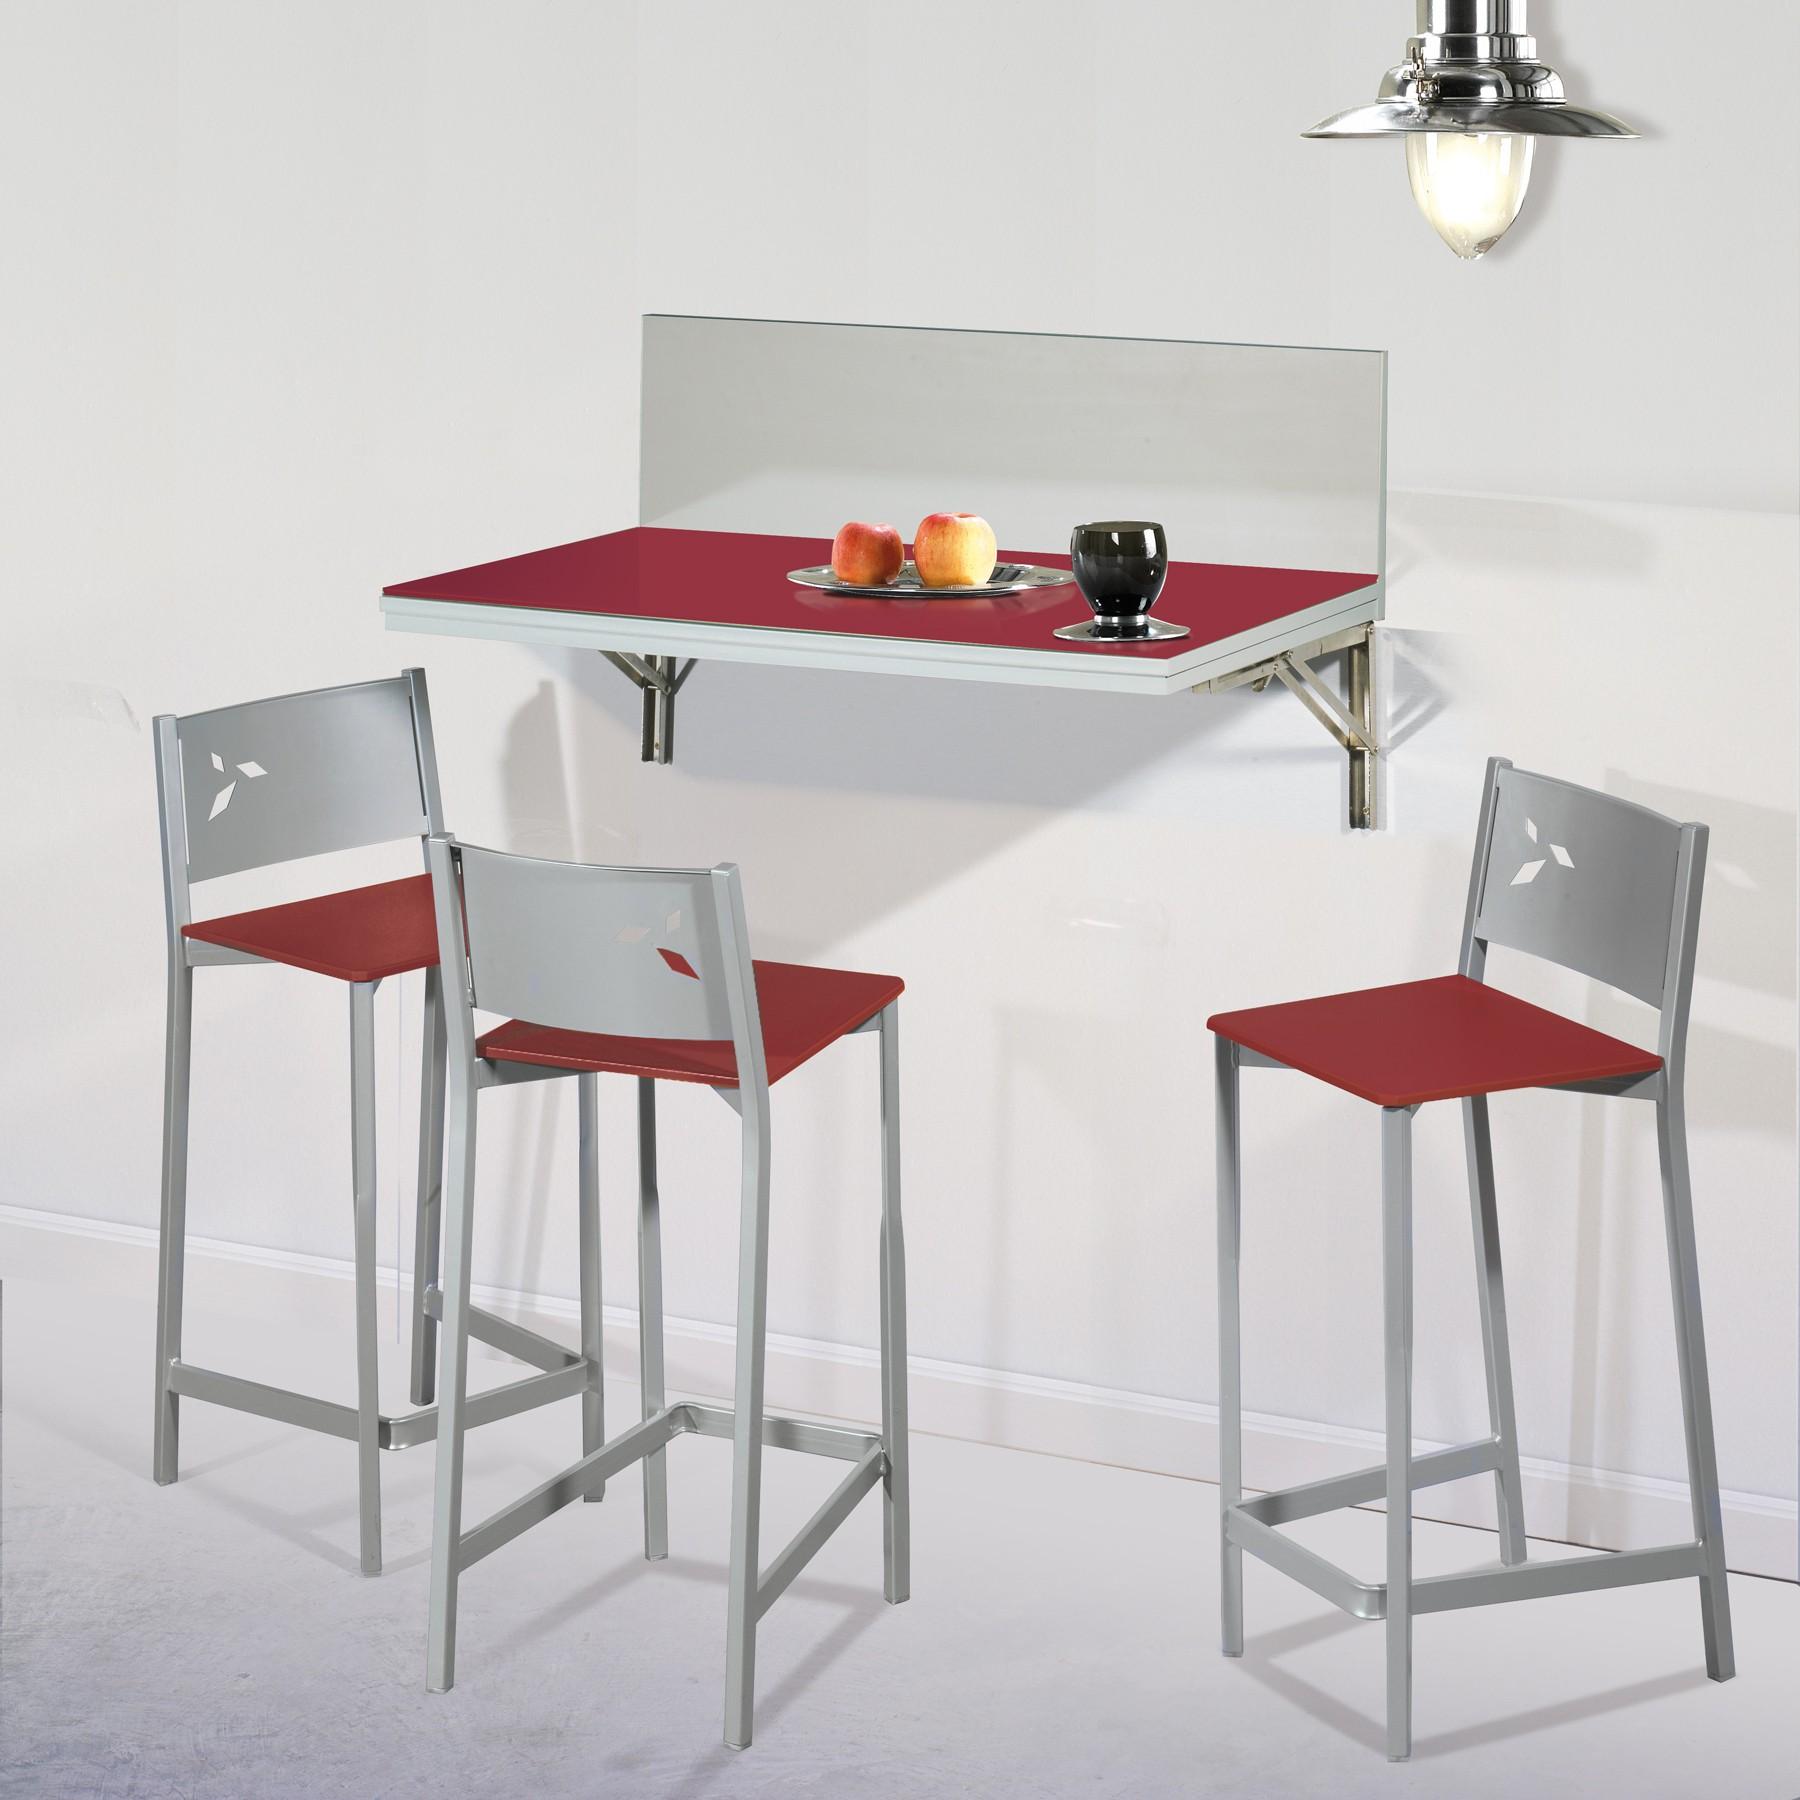 Pack ahorro en mesa de cocina de pared con dos taburetes modelo dkg - Sillas plegables de cocina ...